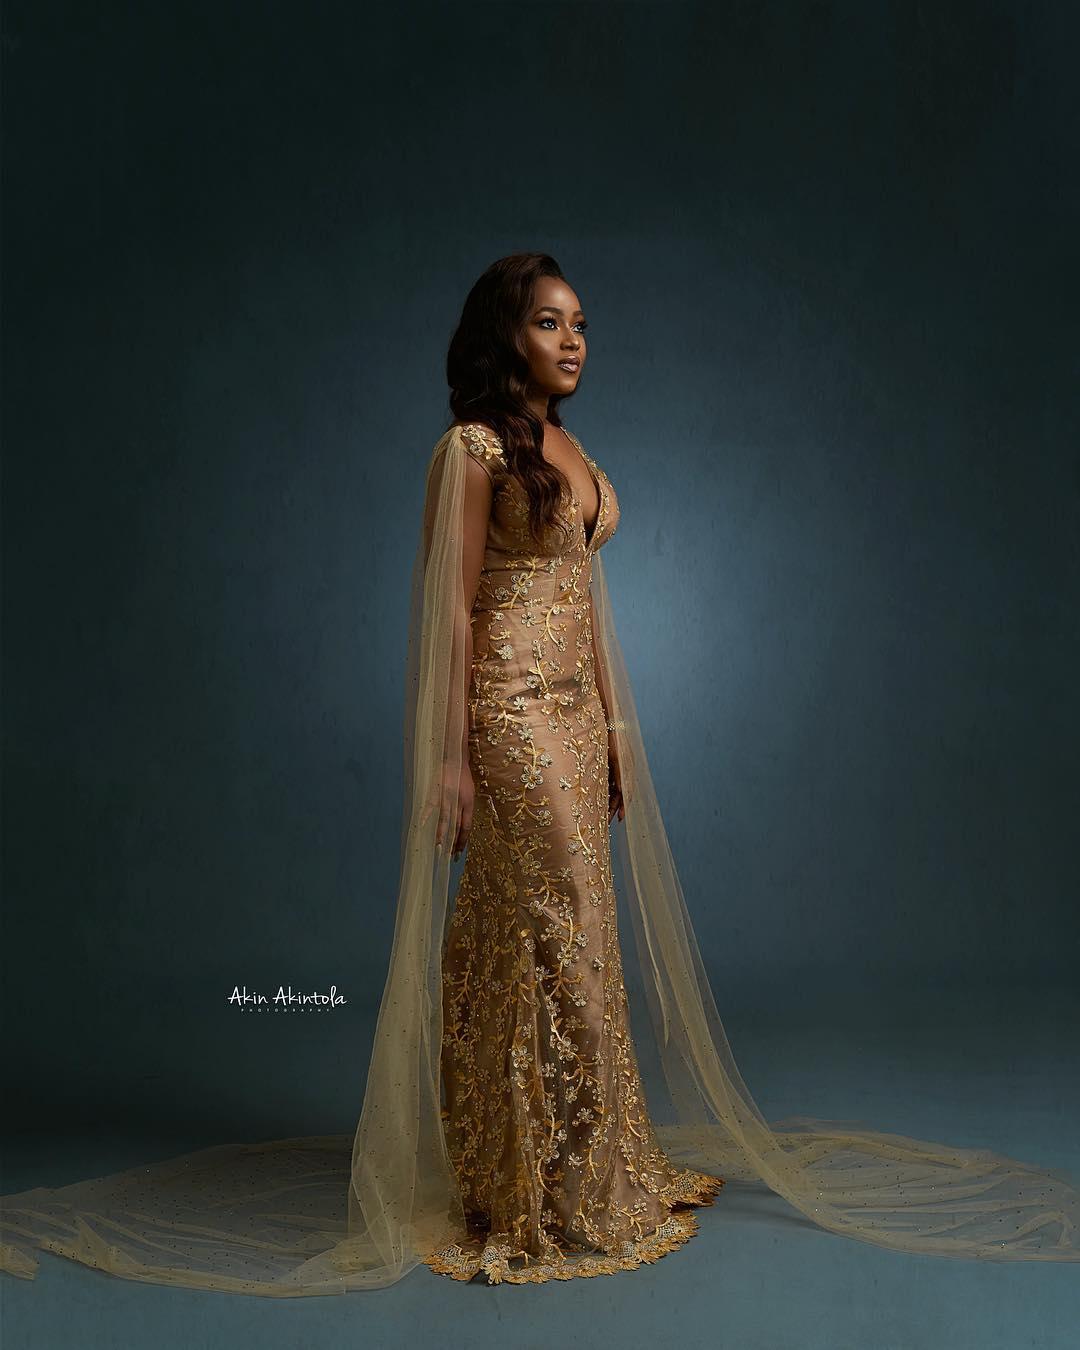 ugandan-born-nigerian-beauty-expert-fiona-kenee-wagbatsoma-celebrates-her-30th-birthday-looking-glam-srcelebrate